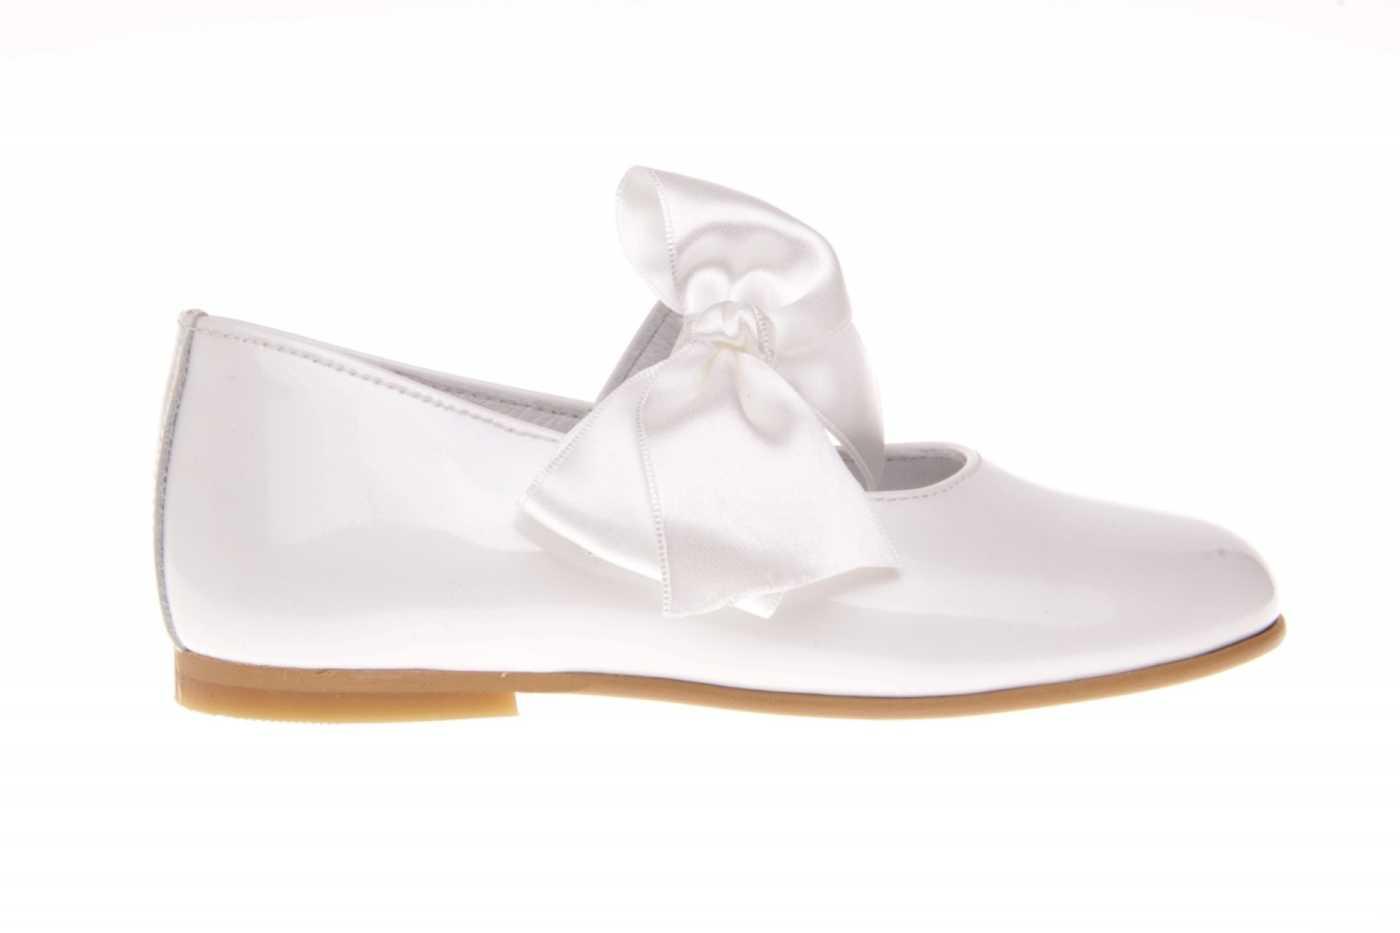 b6f3f9a2 Comprar zapato tipo JOVEN NIÑA estilo MERCEDES COLOR BLANCO CHAROL ...